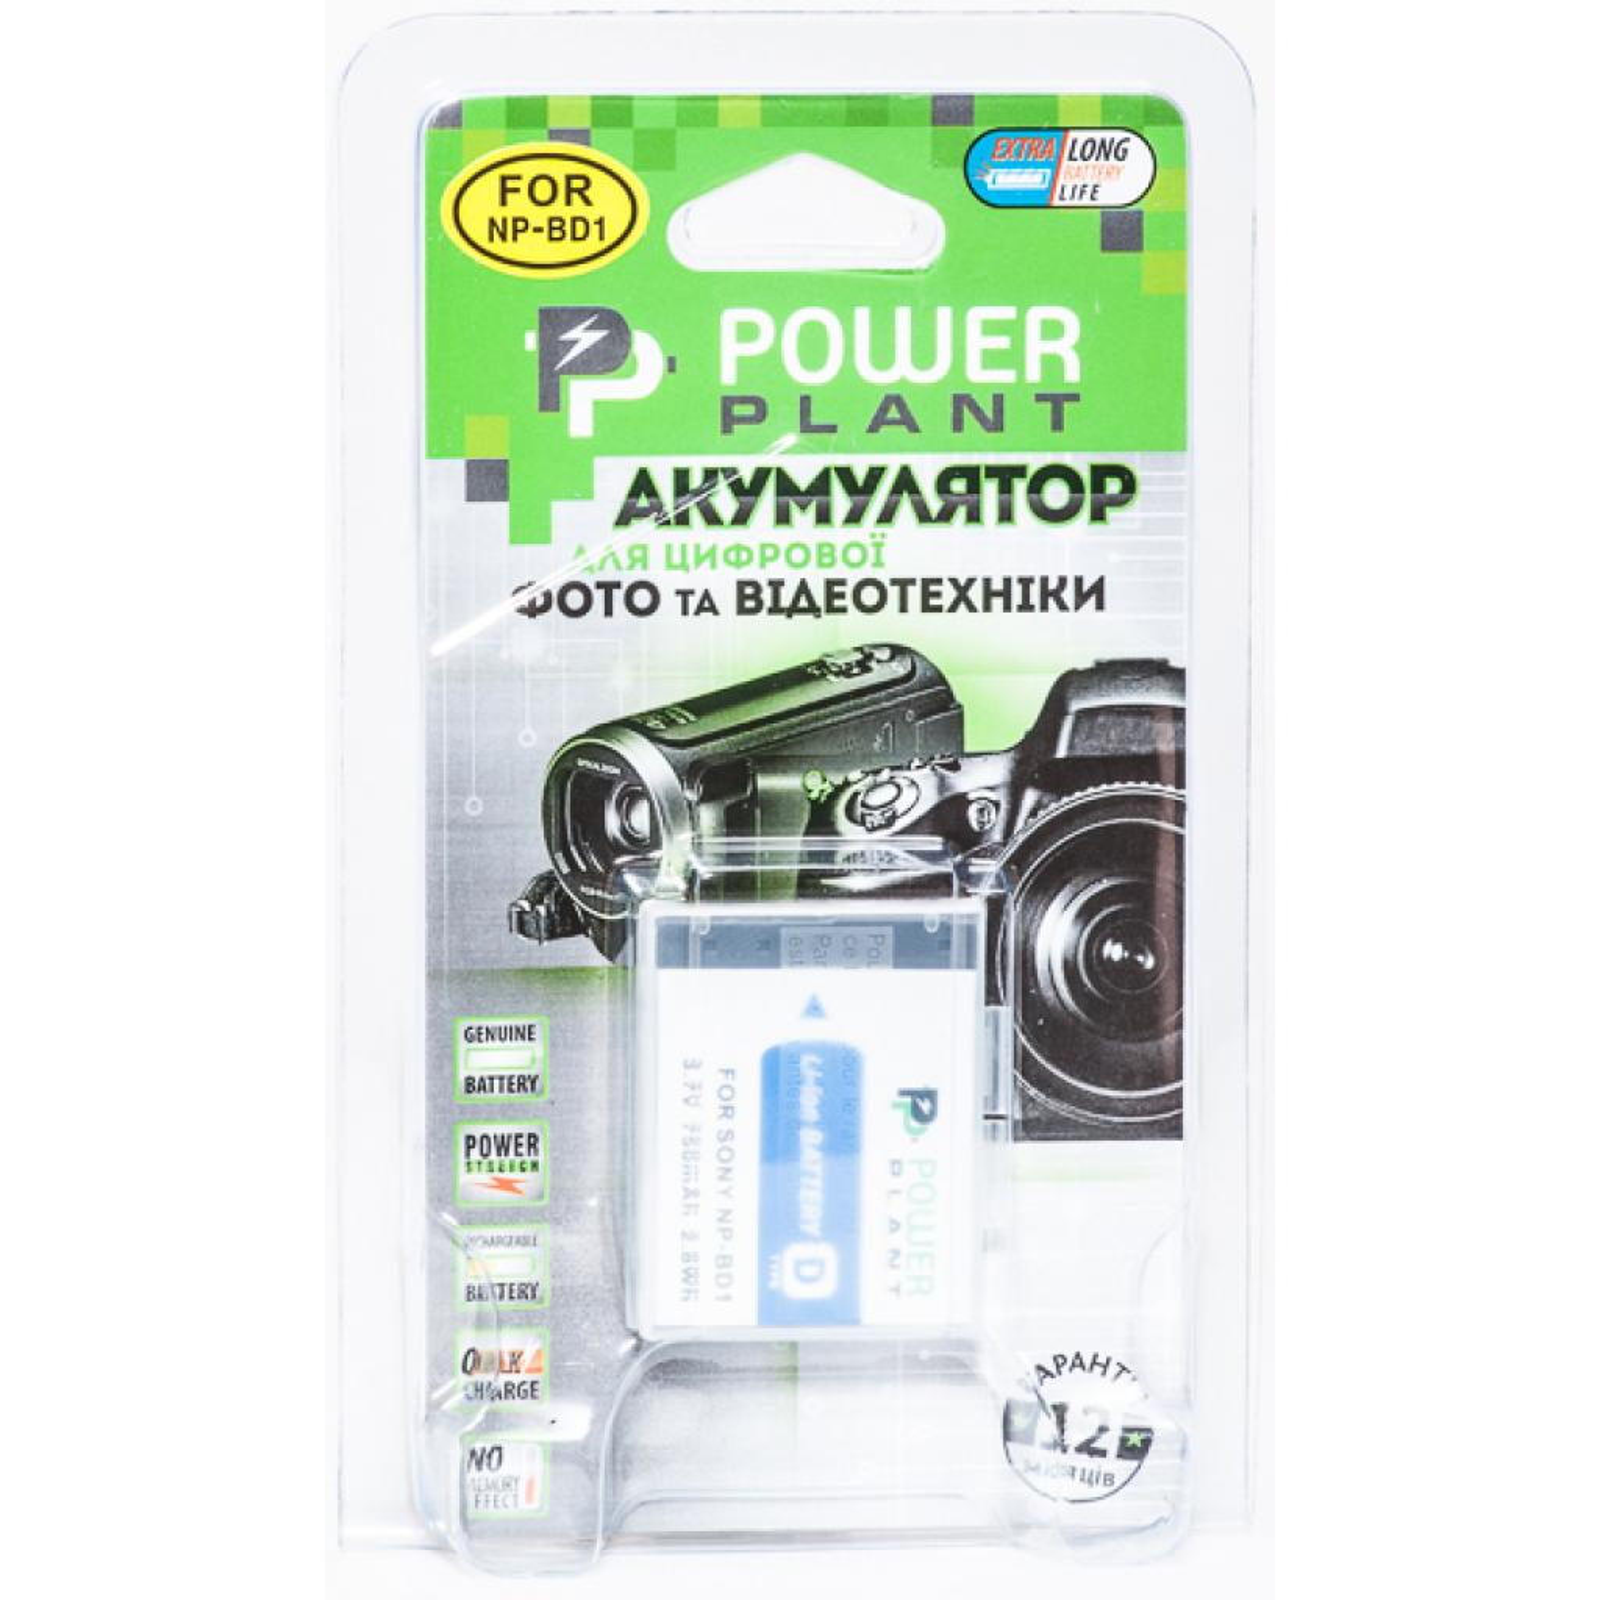 Аккумулятор к фото/видео PowerPlant Sony NP-BD1, NP-FD1 (DV00DV1204) изображение 3